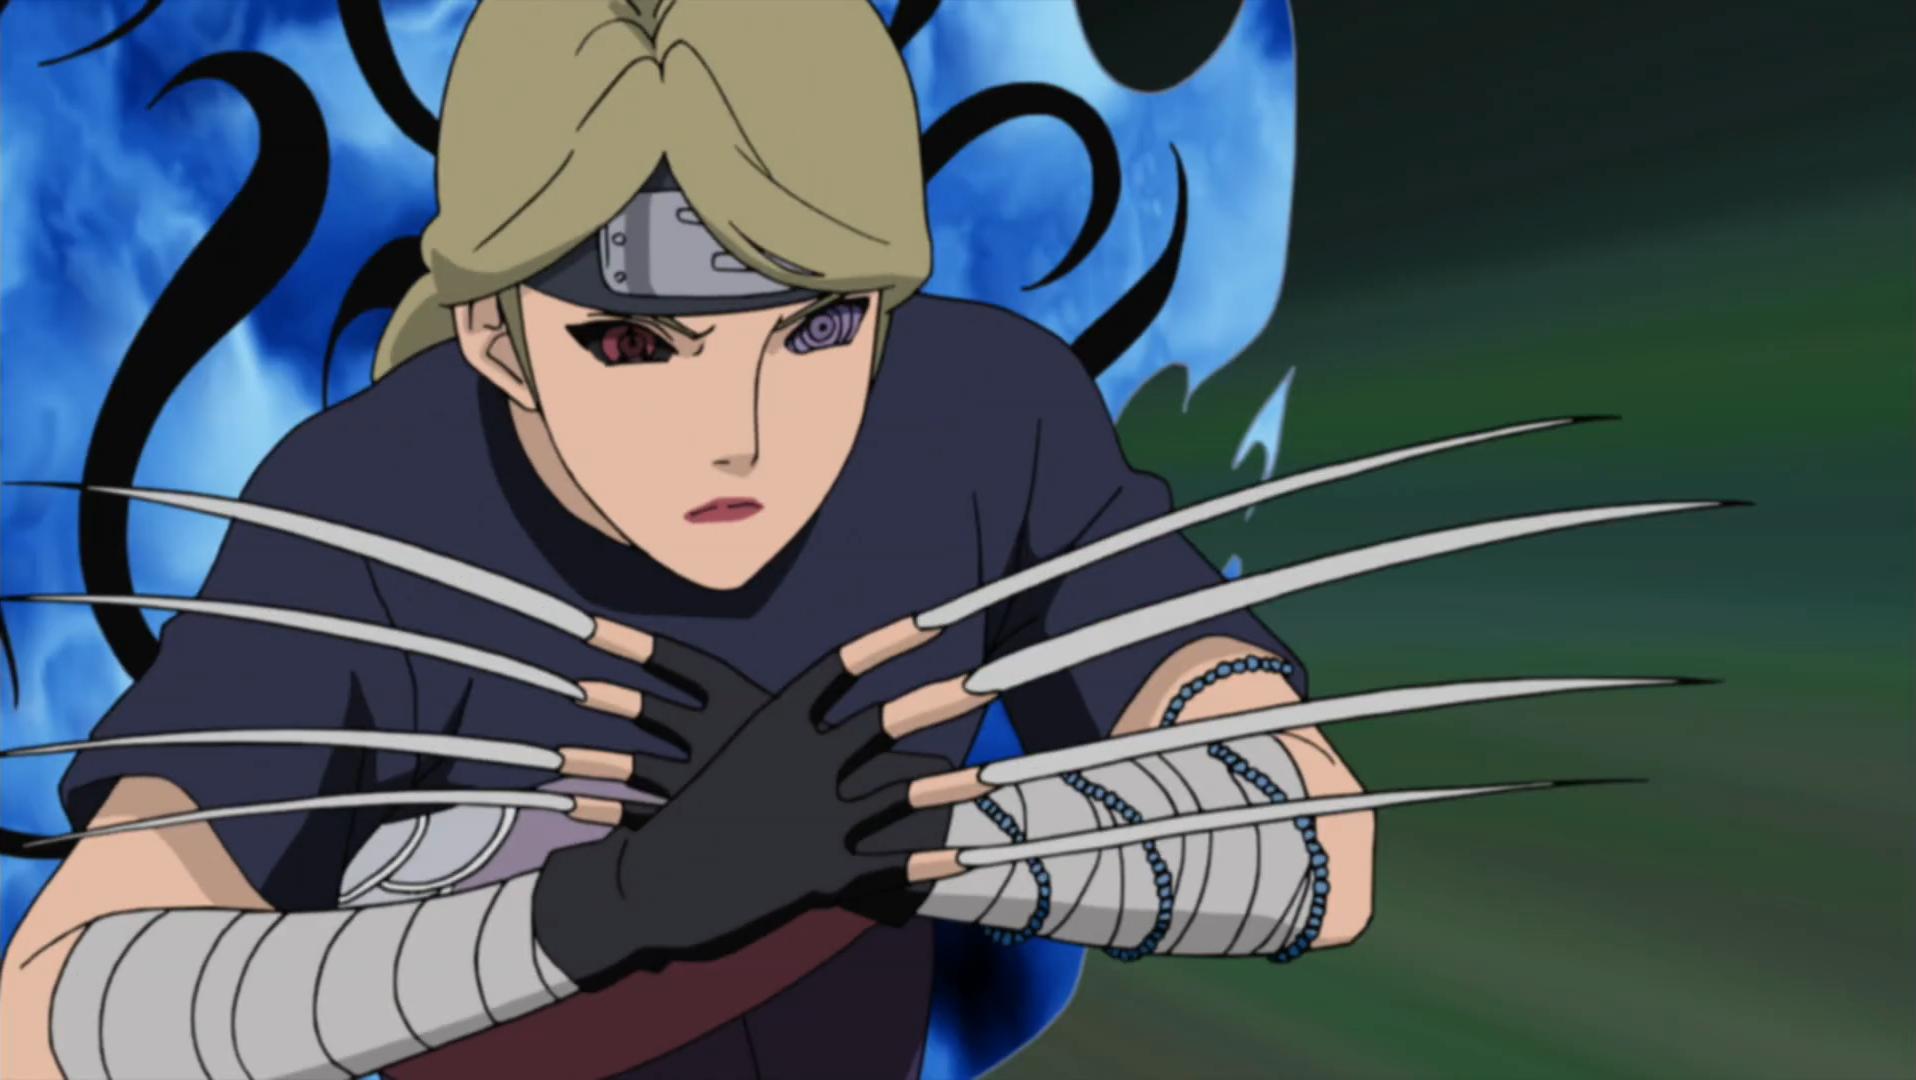 Rank Jins Except(Gaara, Naruto, Bee, Minato, Kushina)